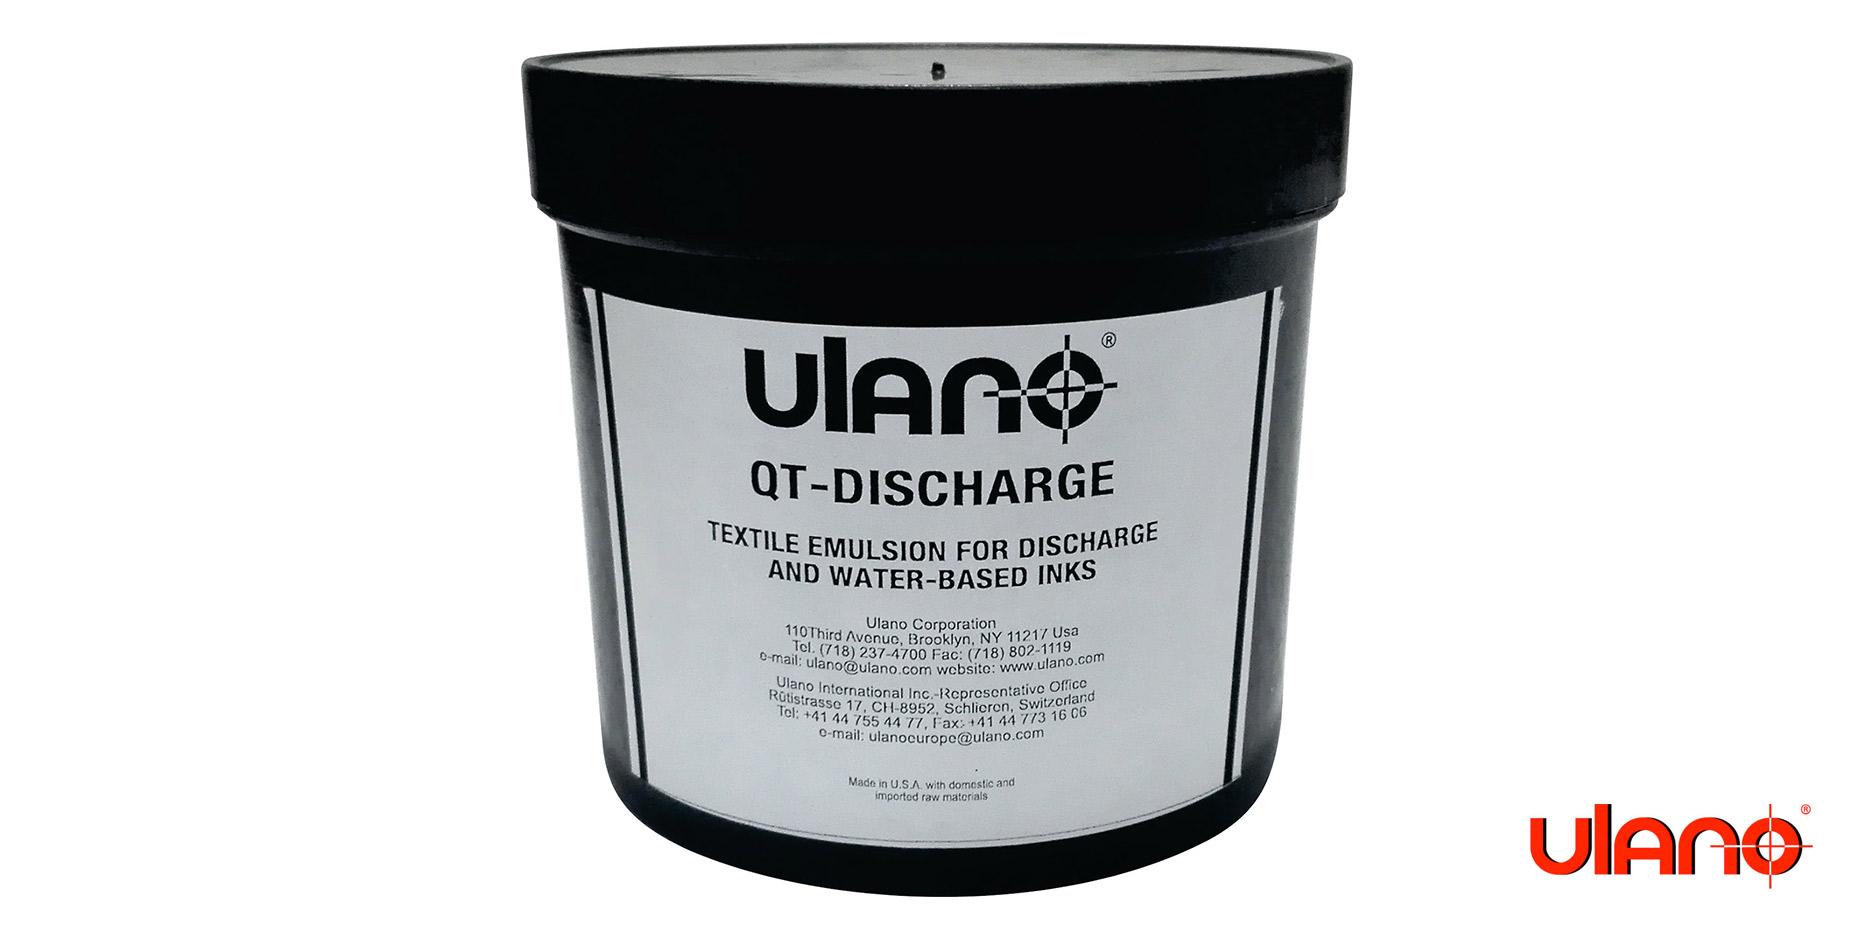 QT-Discharged